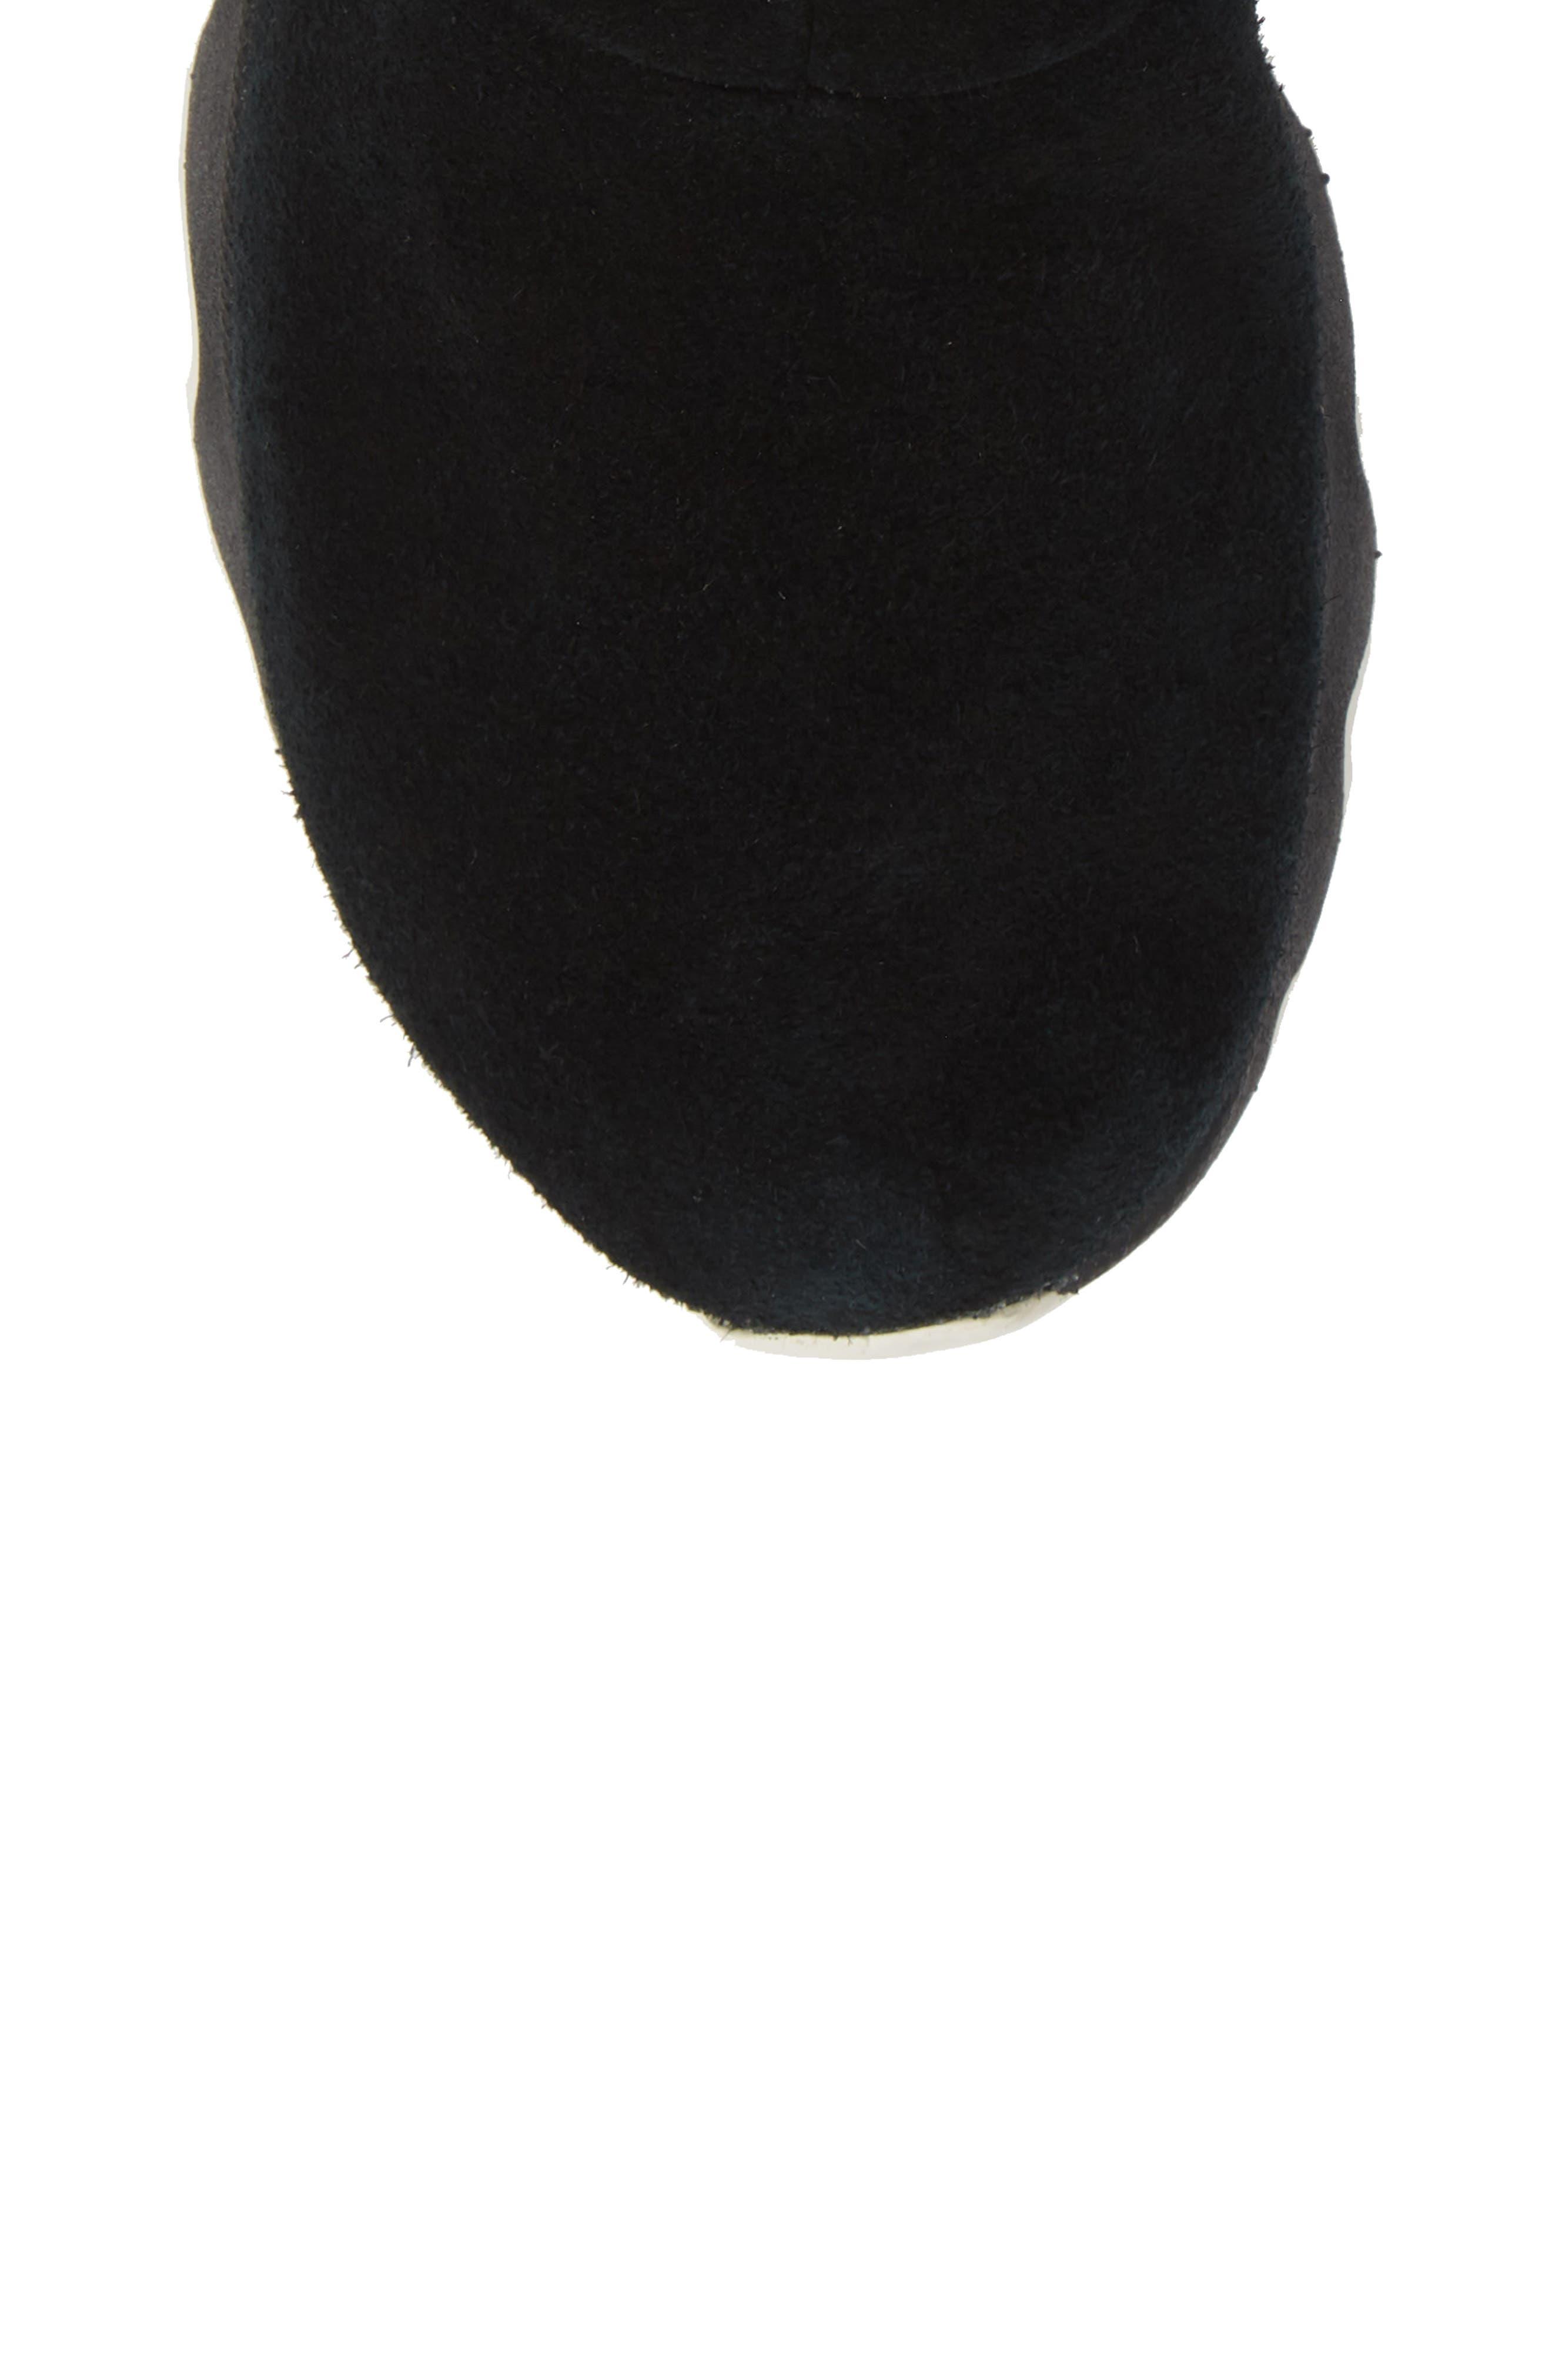 Kinetic Insulated Waterproof Short Boots,                             Alternate thumbnail 5, color,                             BLACK/ SEA SALT